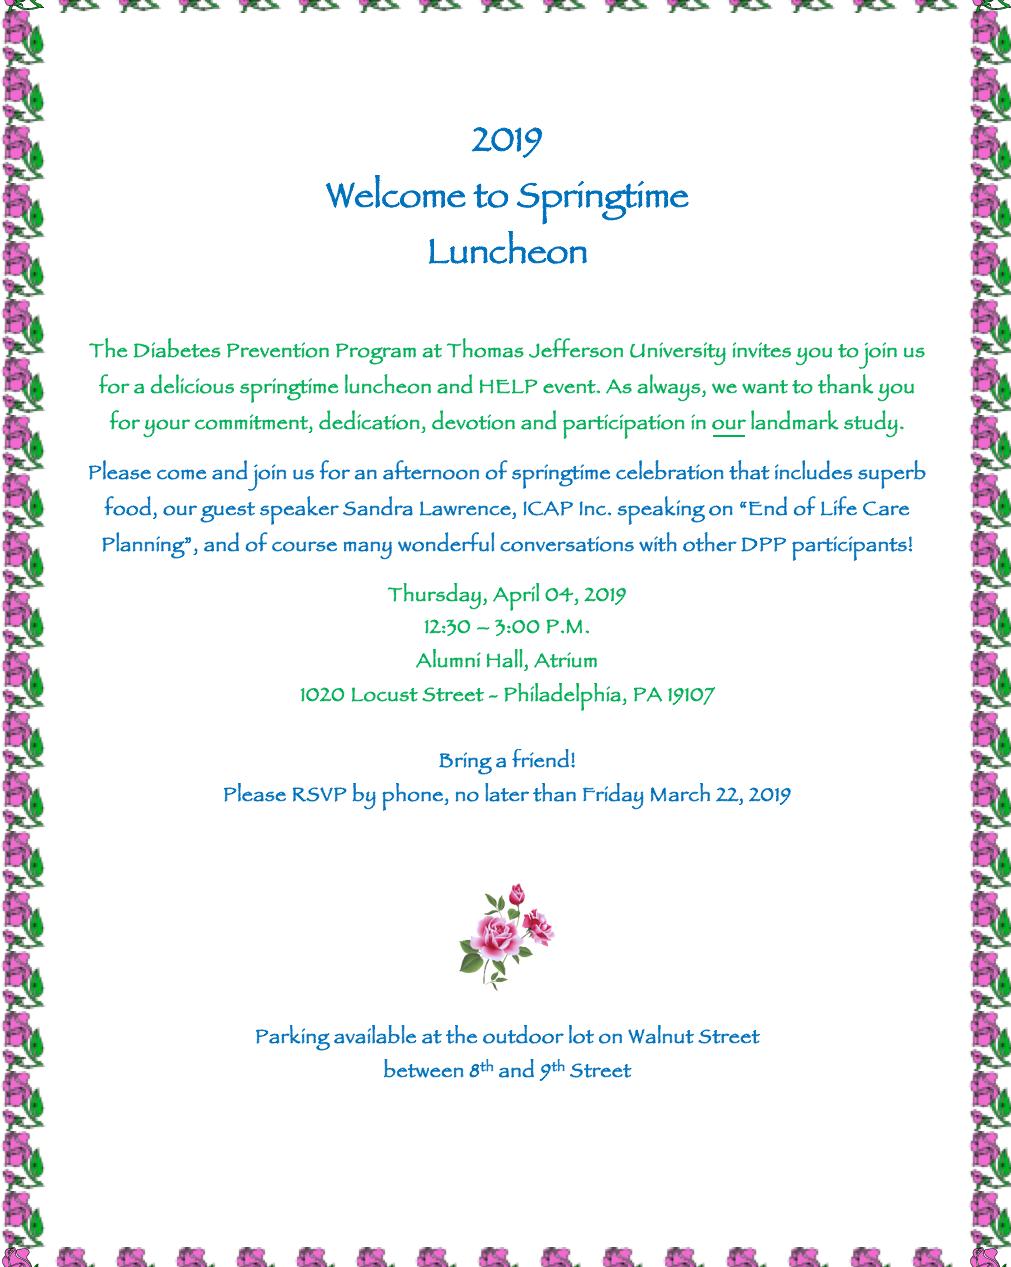 Springtime Luncheon